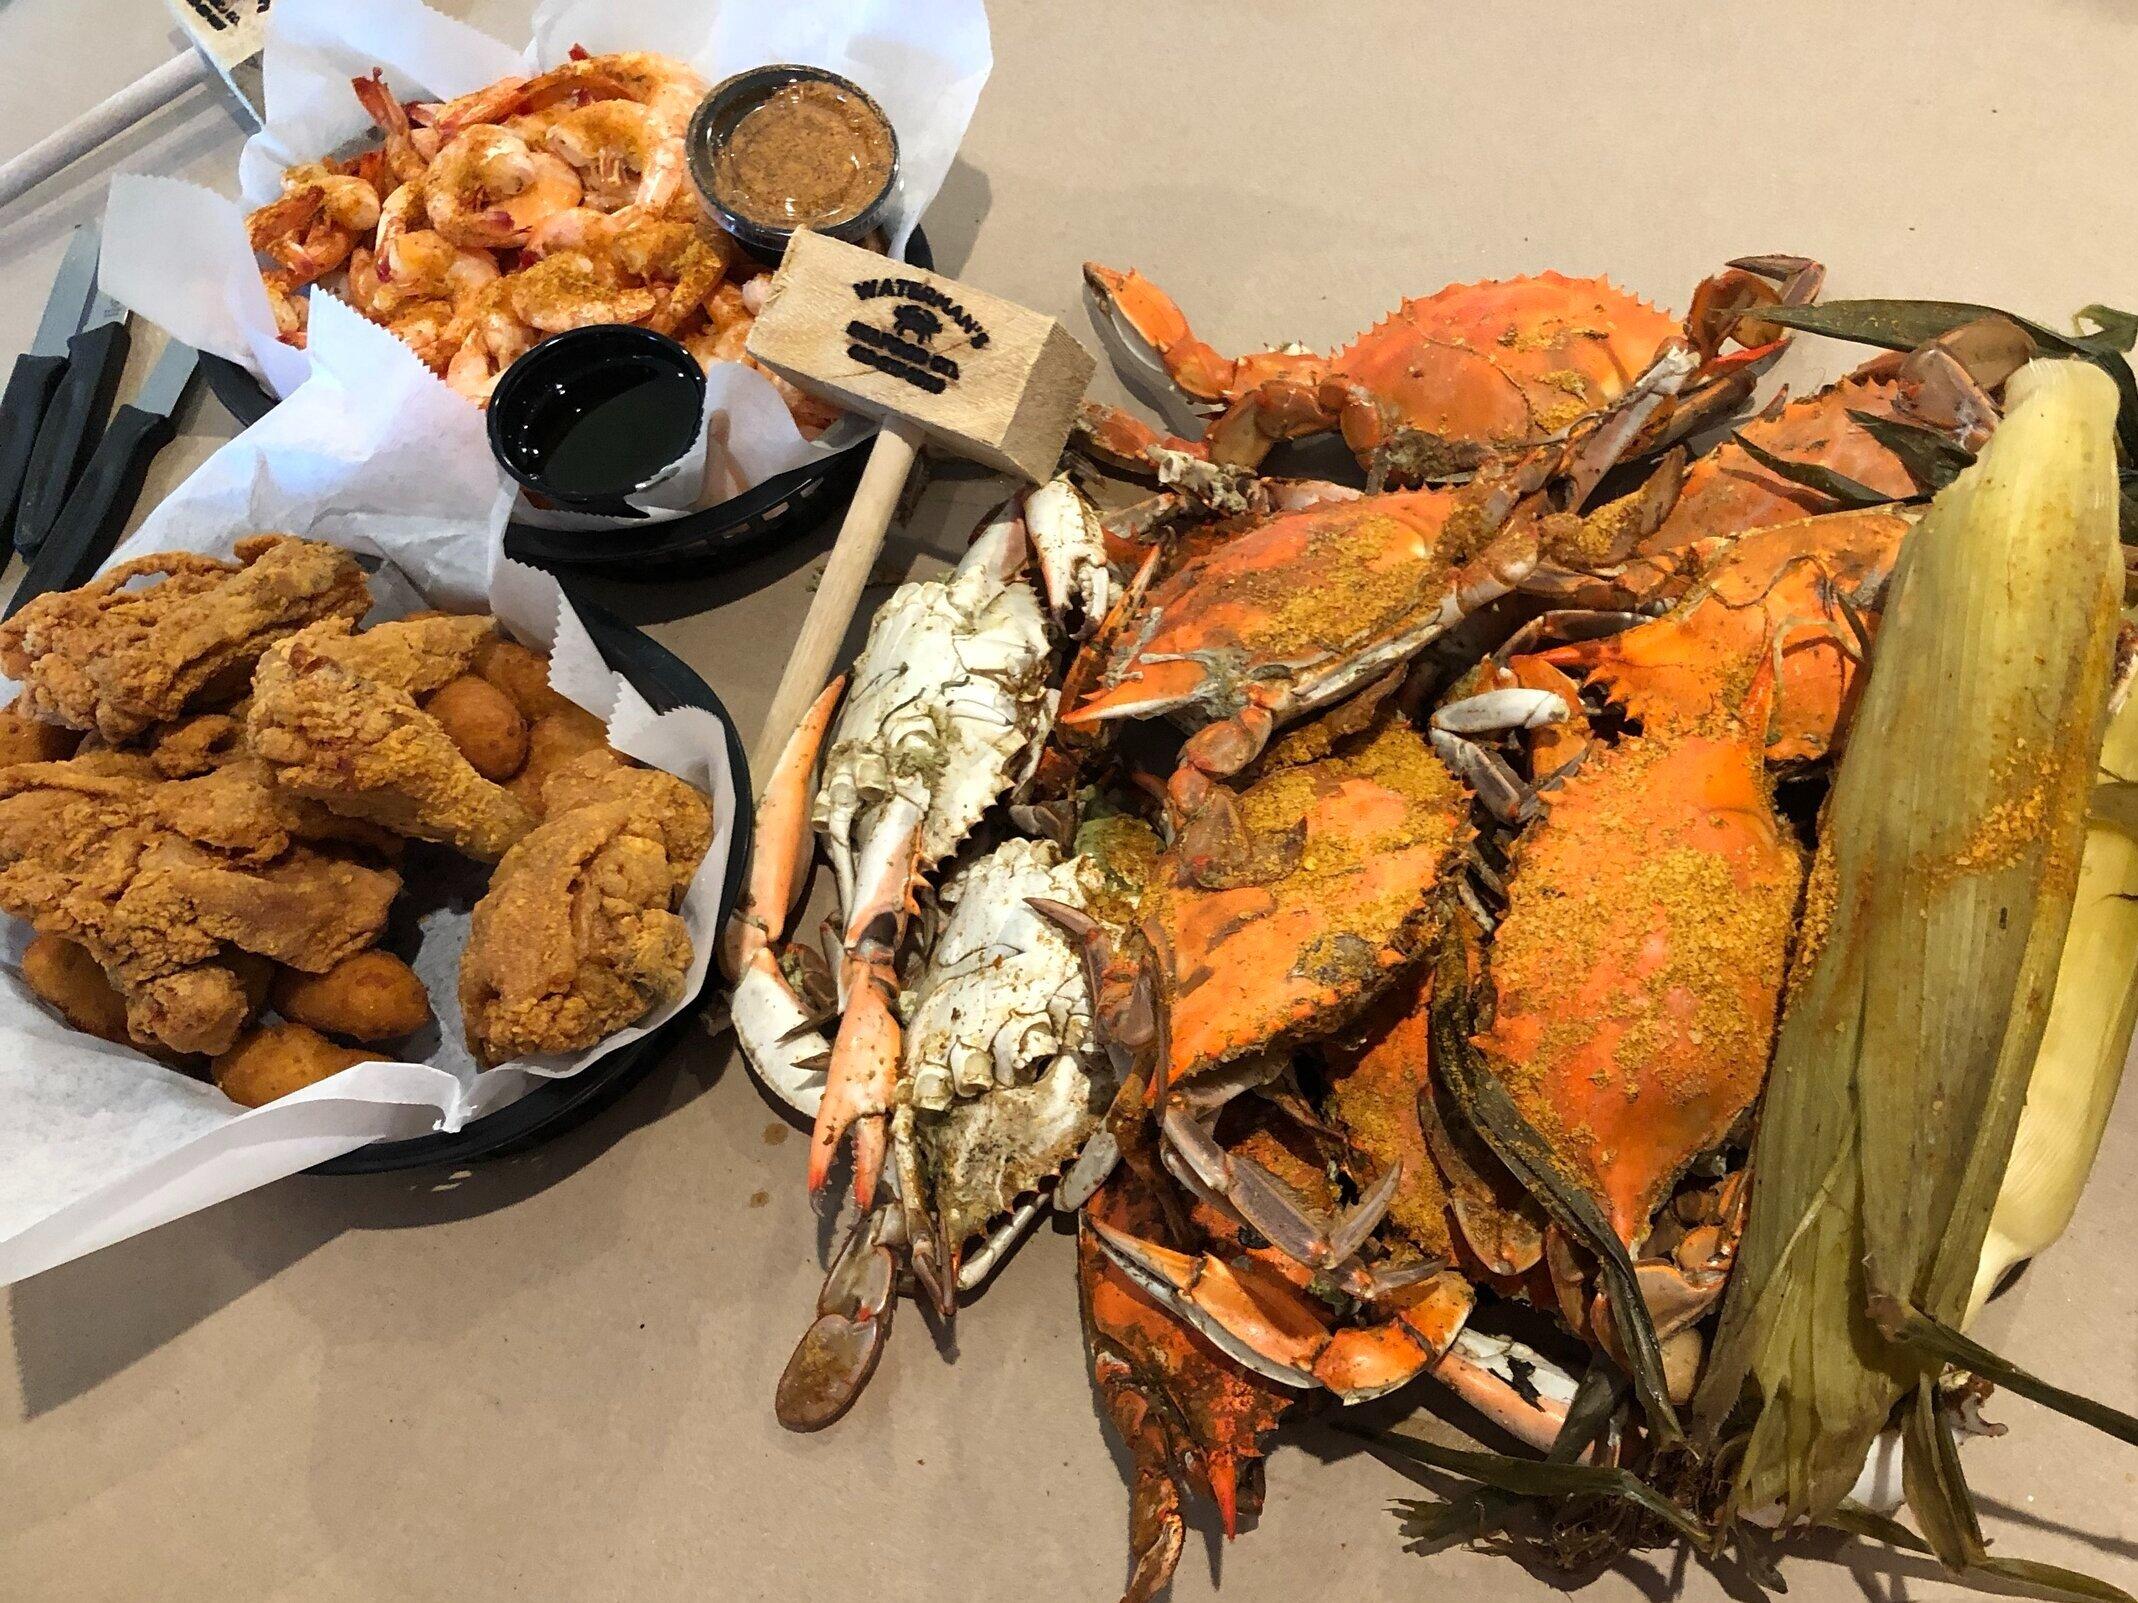 Maryland Blue Crab feast on our Food Bucket List.